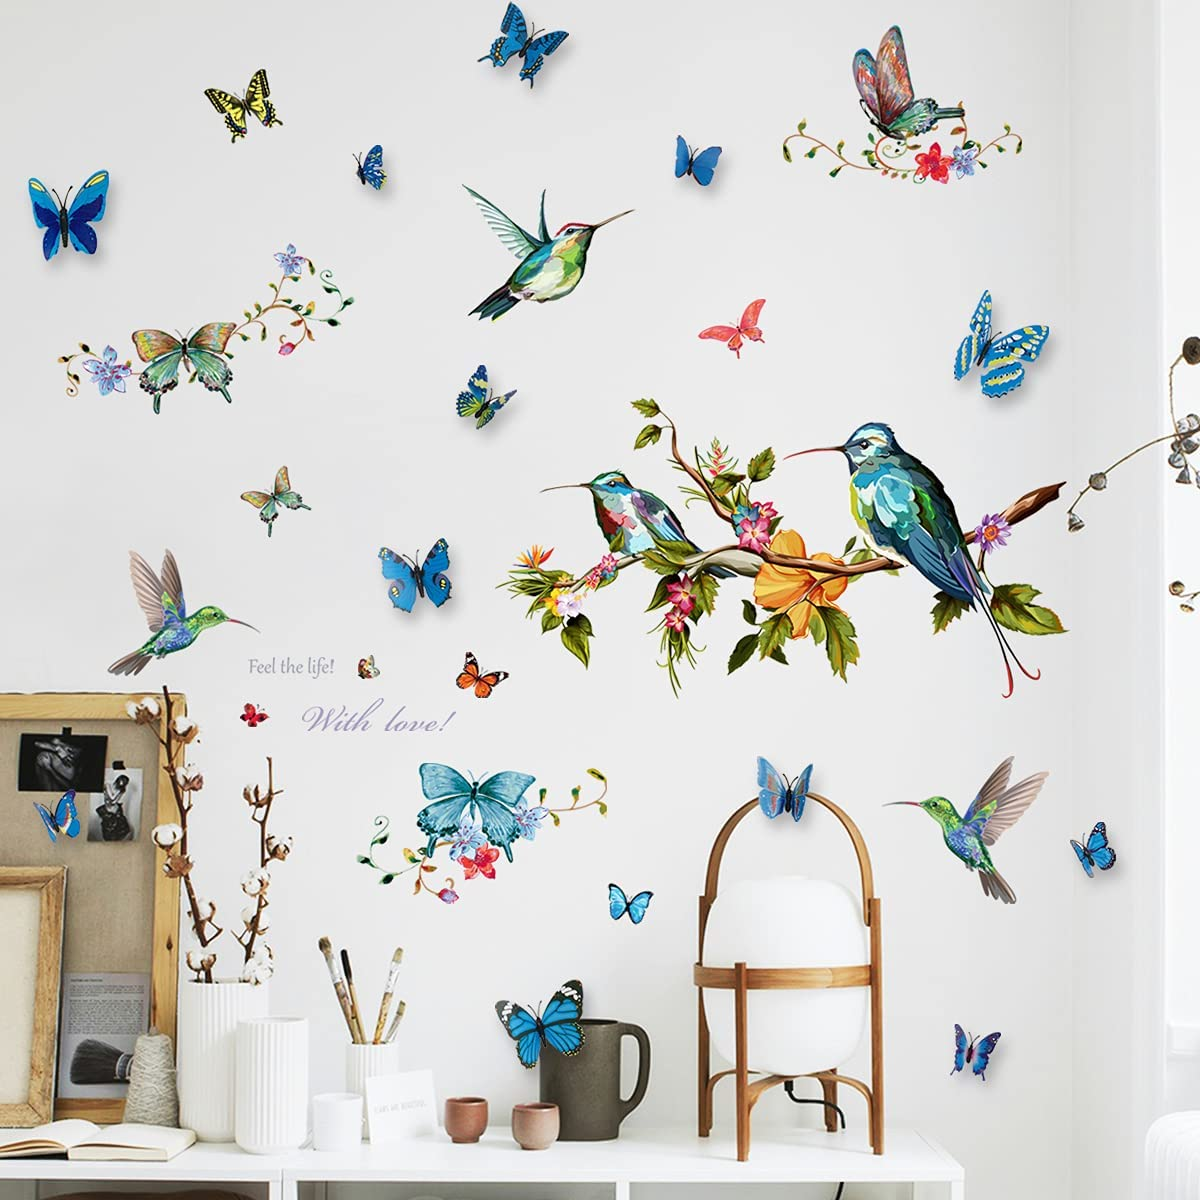 DIY Hummingbirds Wall Decal with 12Pcs 3D Butterfly Wall Sticker, LASZOLA Removable Watercolor Bird Flower Butterflies Home Nursery Decor Art Murals Paper Decoration for Bedroom Living Room